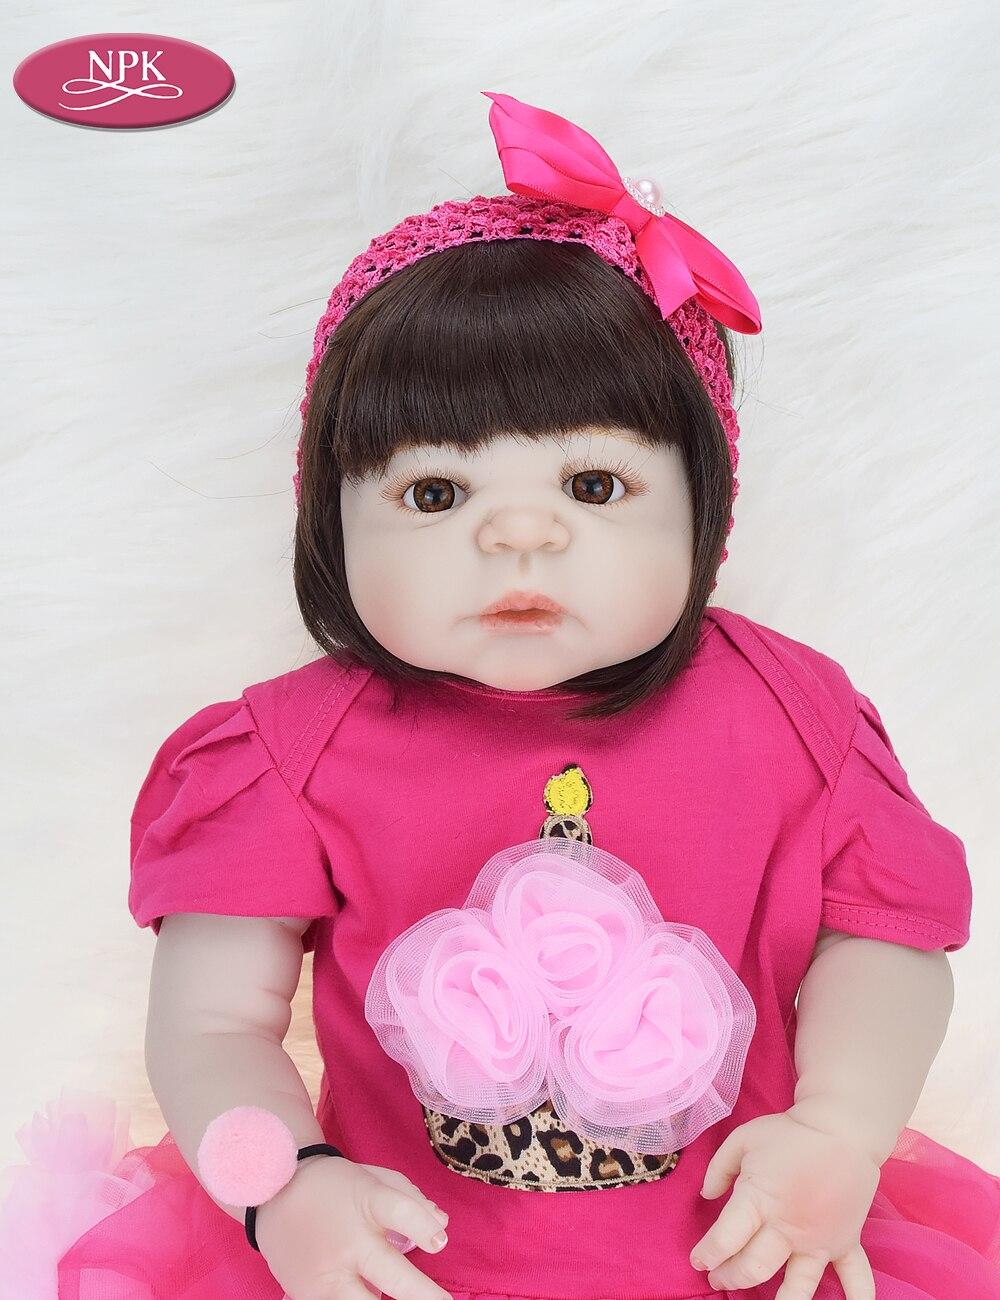 NPK 57CM Full Body Soft Silicone Girls Reborn Baby Doll Bathe Toys Lifelike Princess Girl Dolls Bebe Real Reborn Boneca Menina  (8)